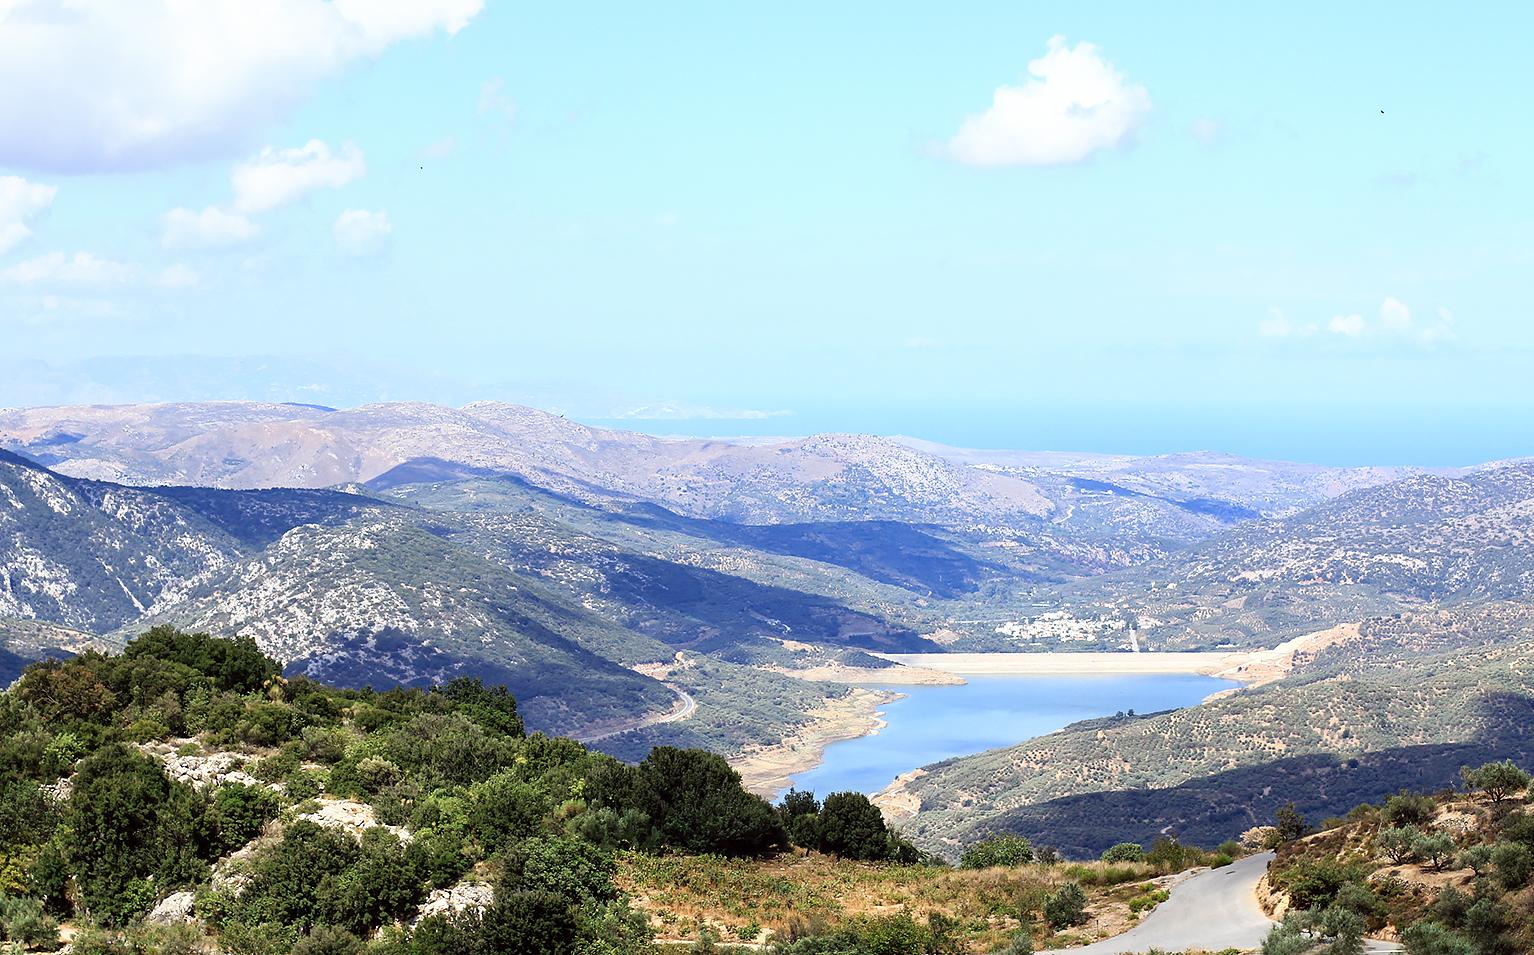 greece_crete_island_photo_2016_travel_blogger_ritalifestyle1